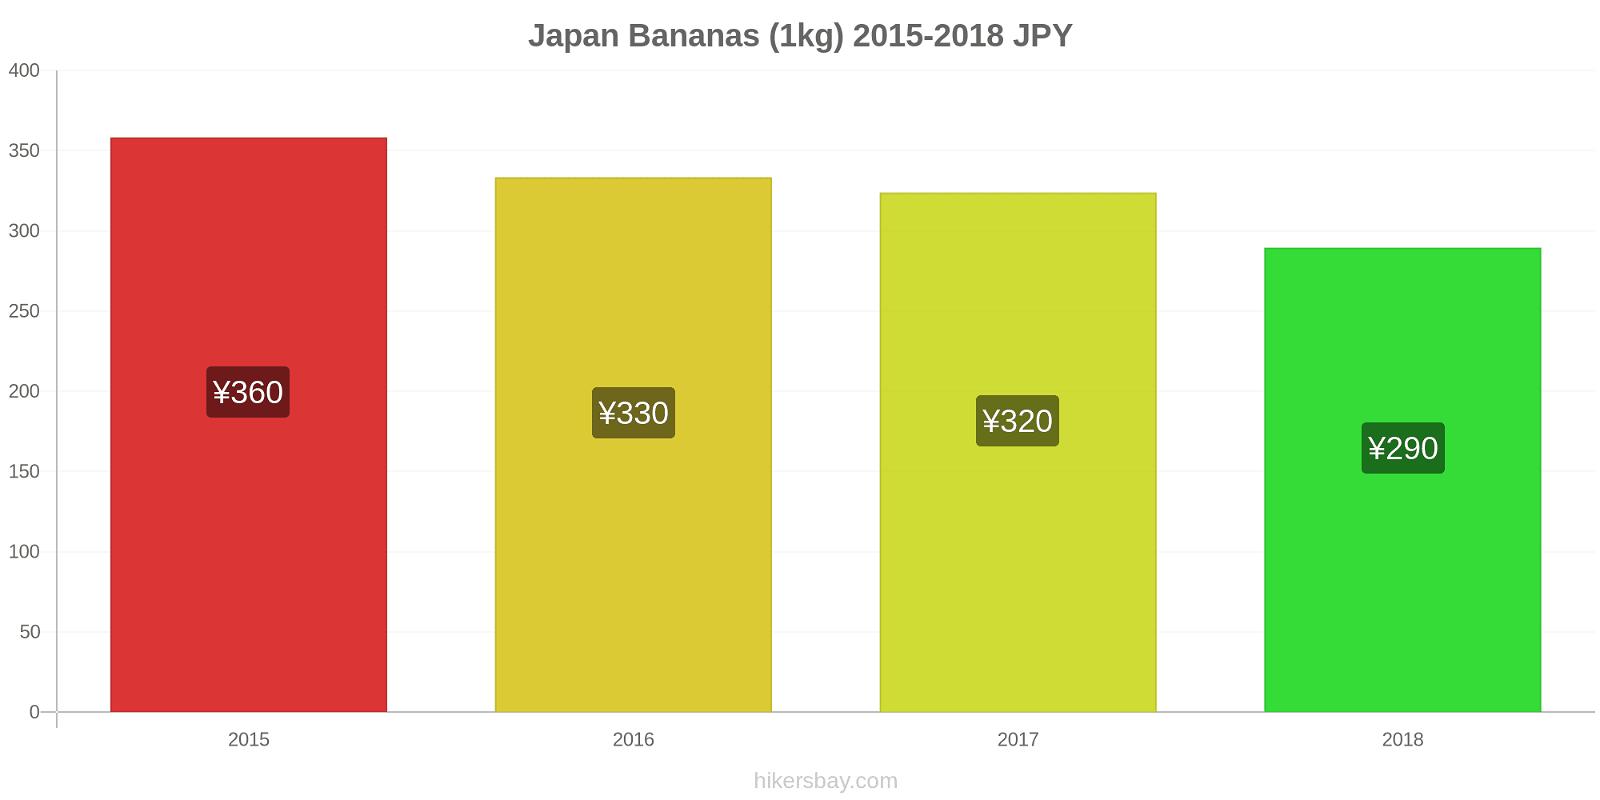 Japan price changes Bananas (1kg) hikersbay.com